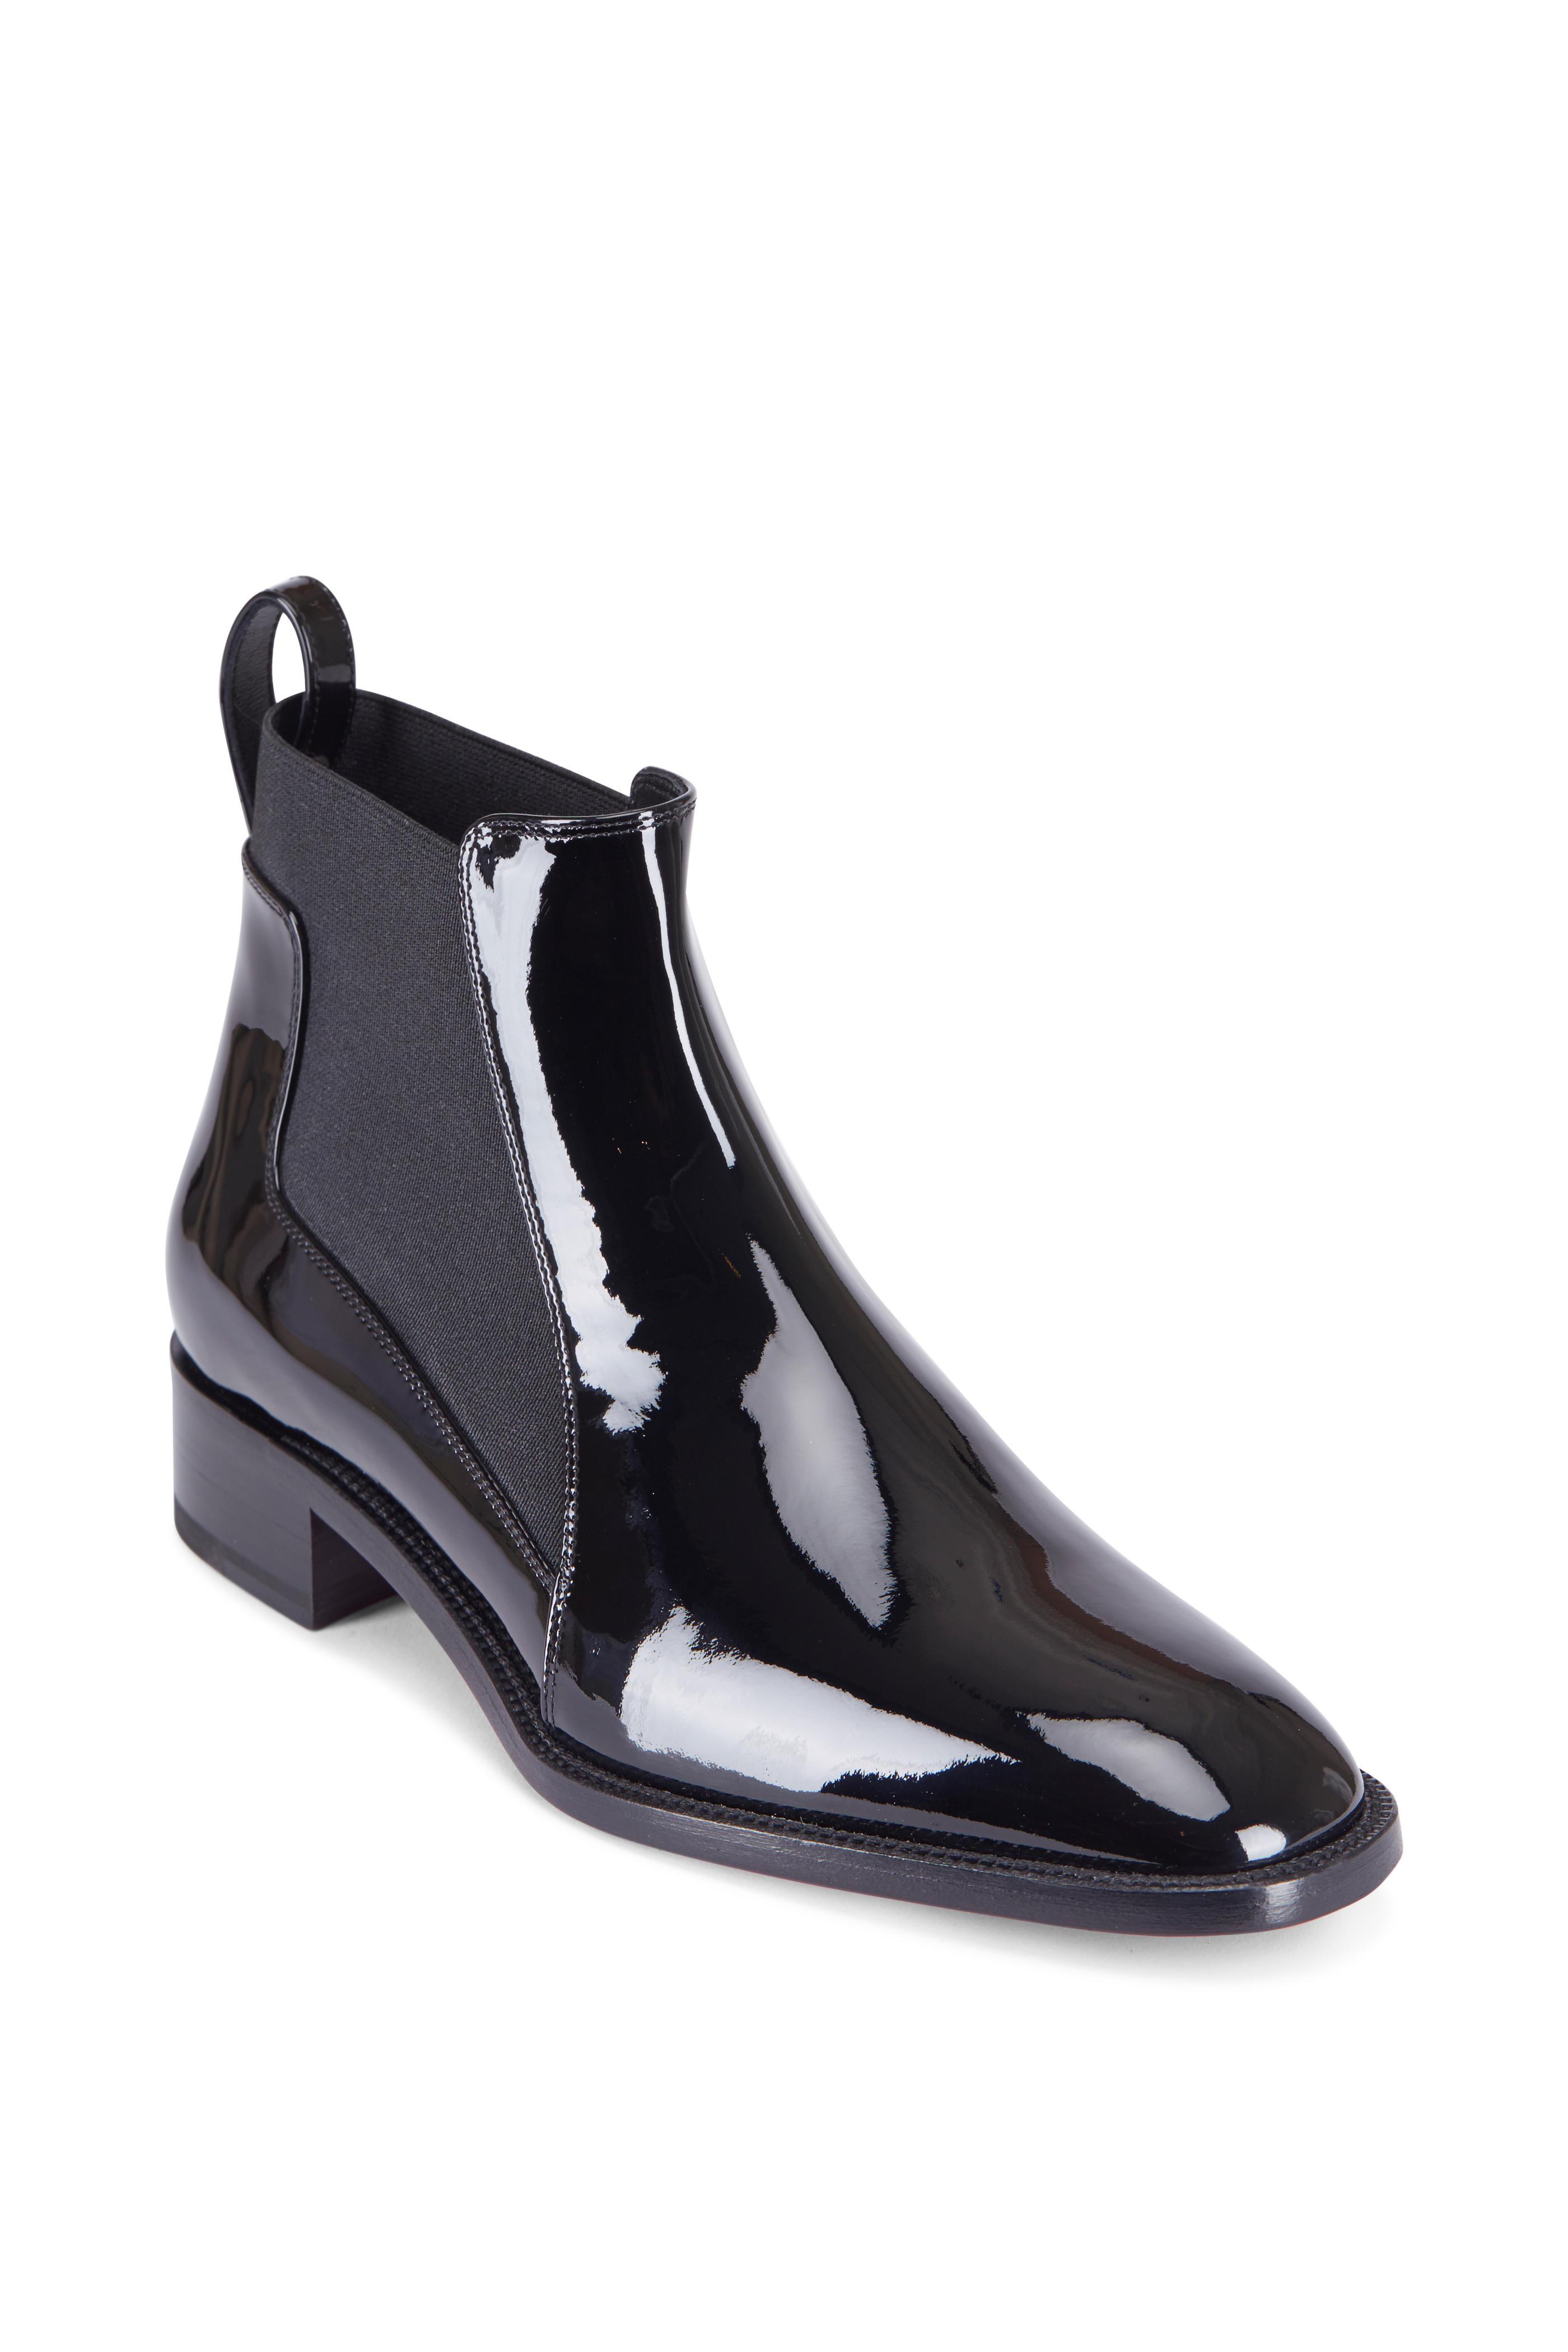 buy popular 4215f 1615f Christian Louboutin - Marmada Black Patent Leather Flat ...